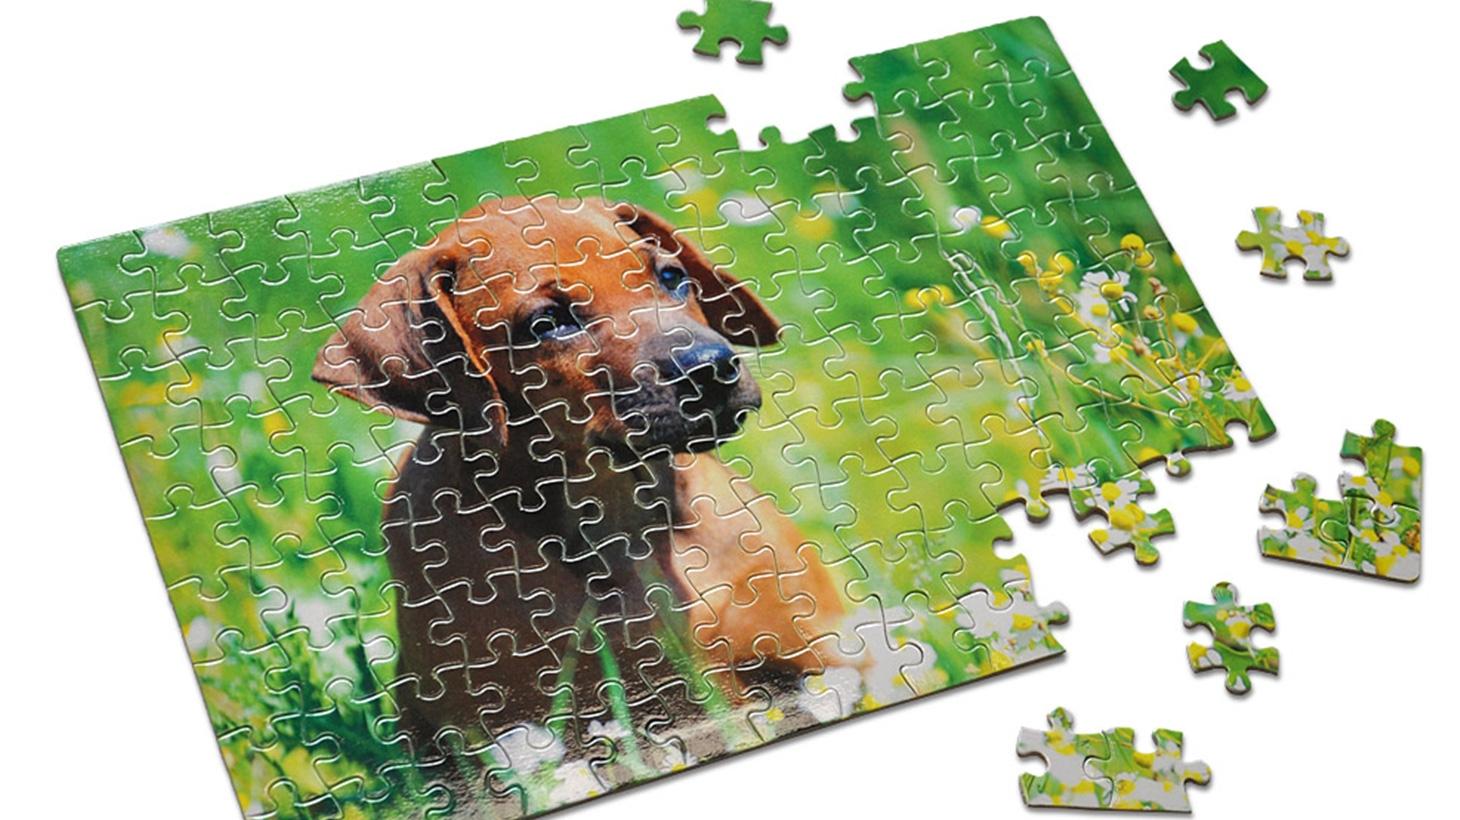 Personalised jigsaw puzzle of dog